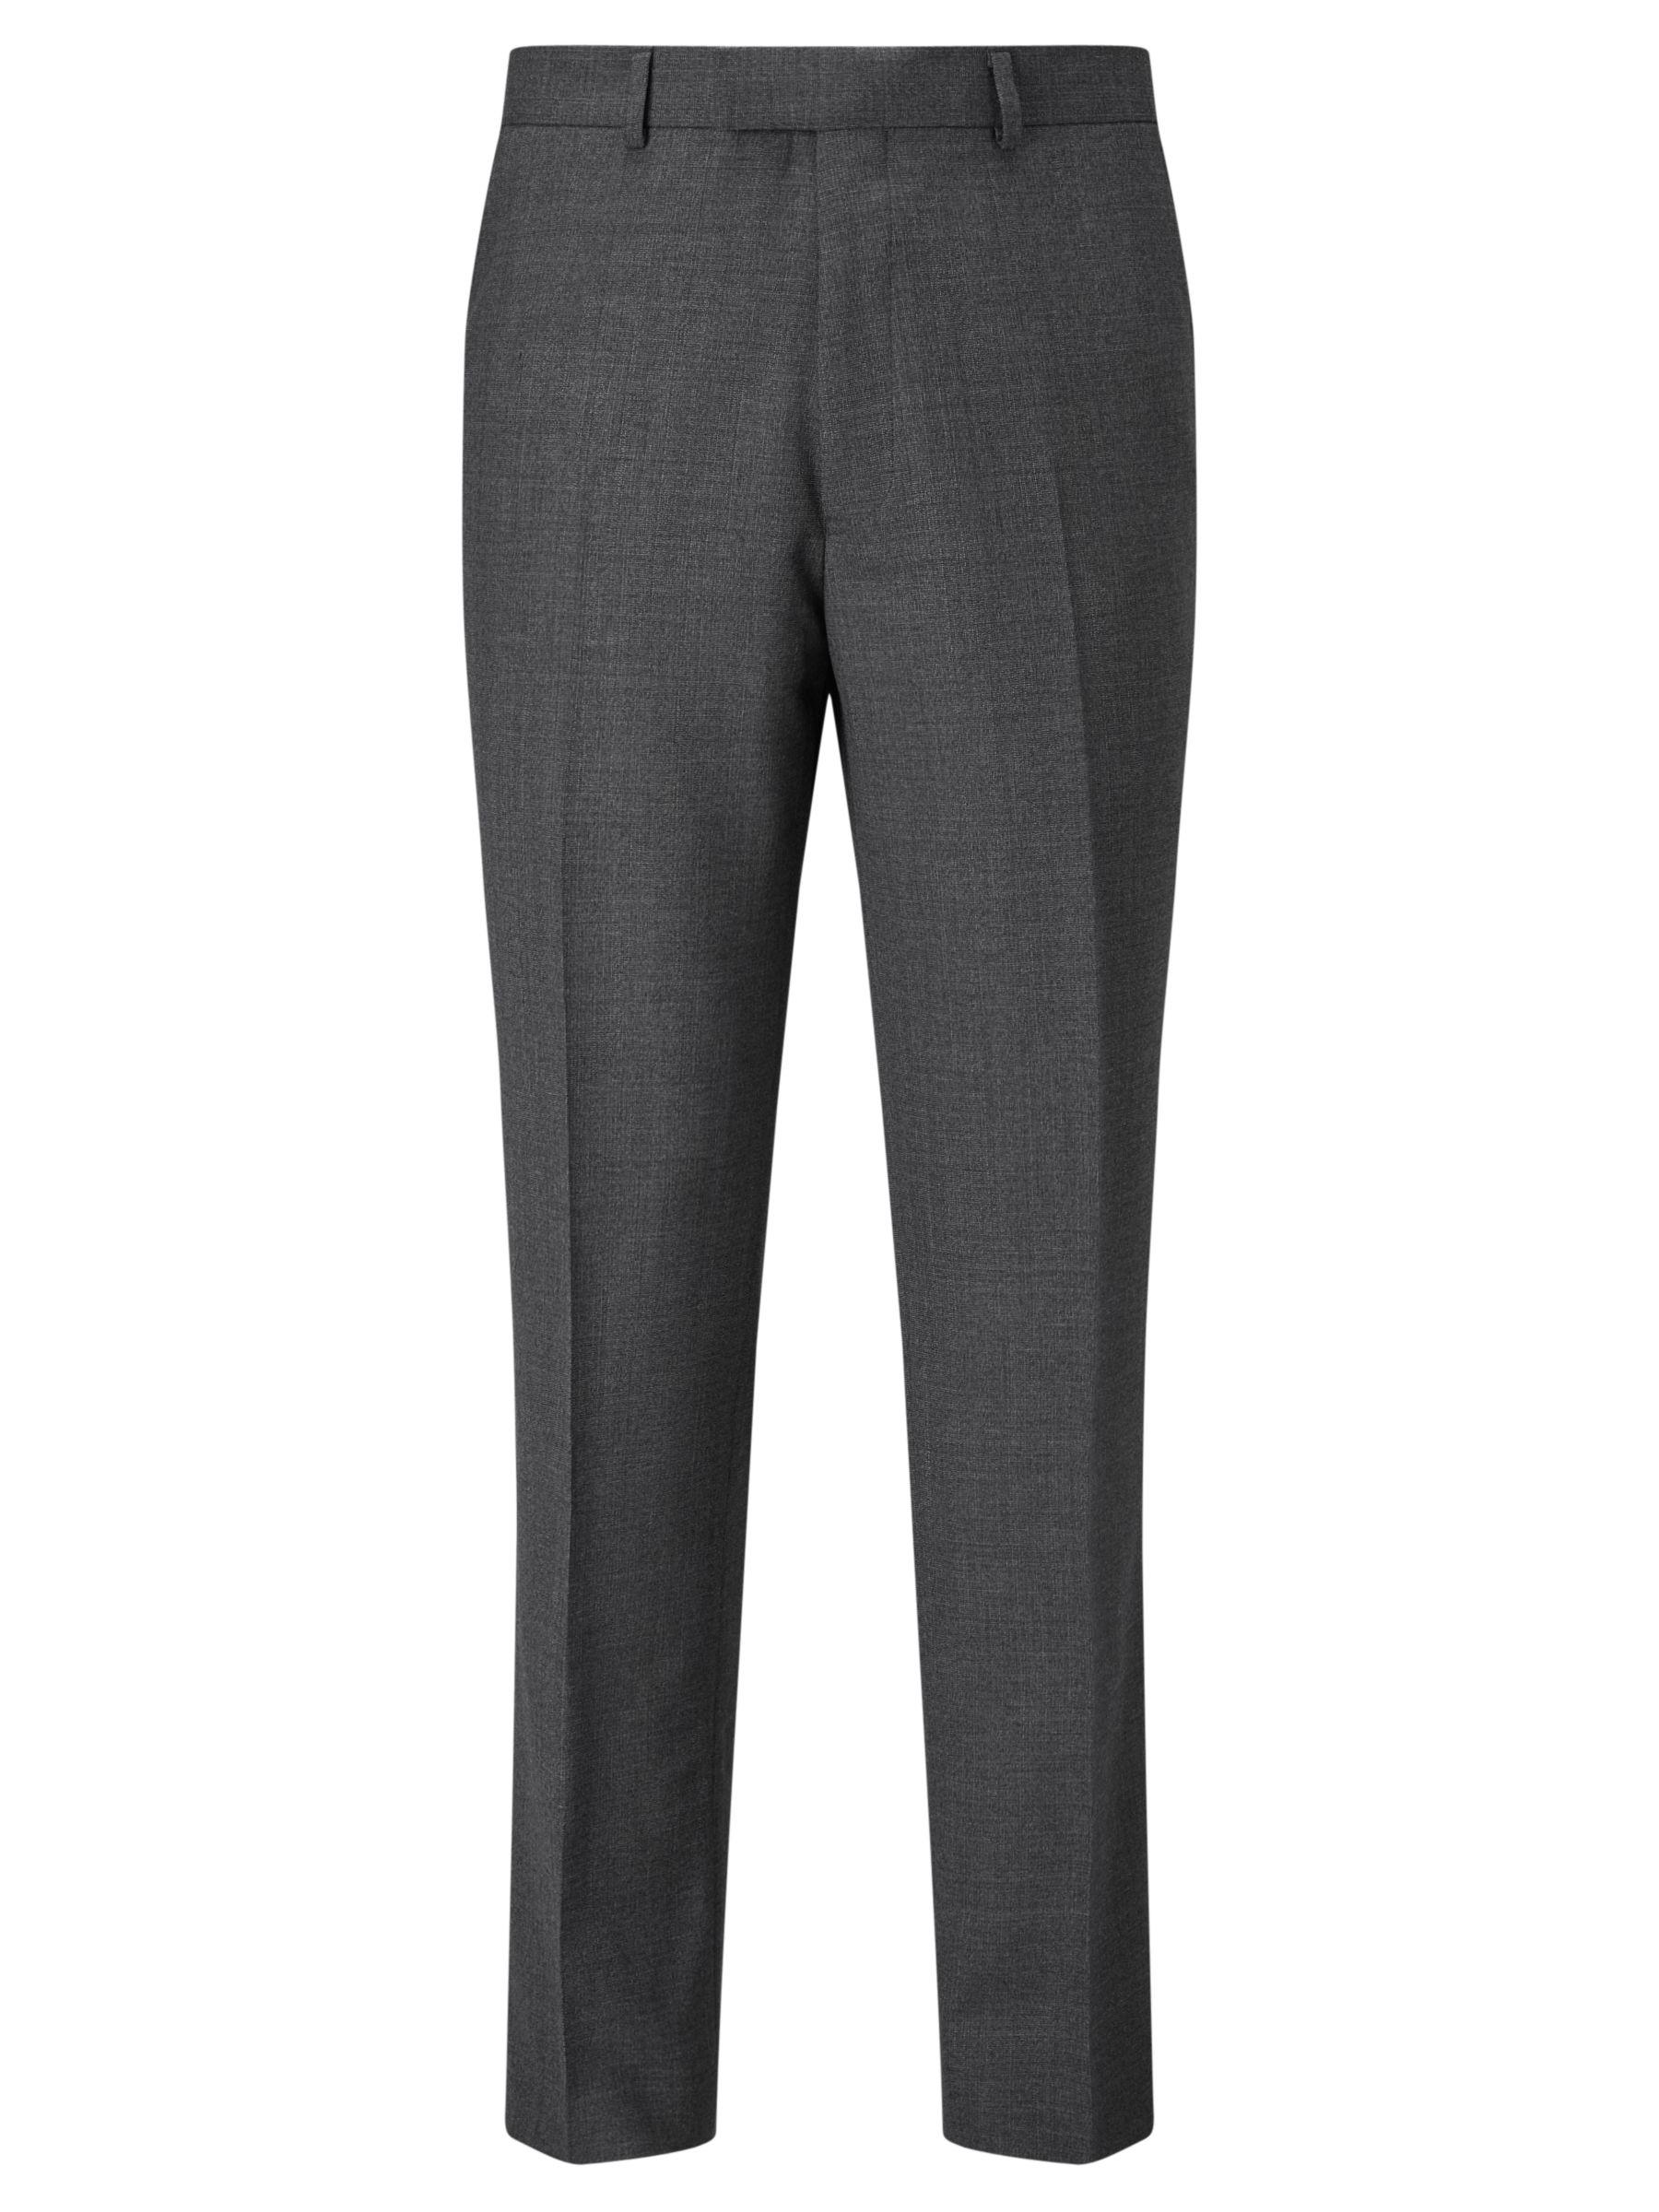 Chester by Chester Barrie Chester by Chester Barrie Semi Plain Wool Tailored Suit Trousers, Grey